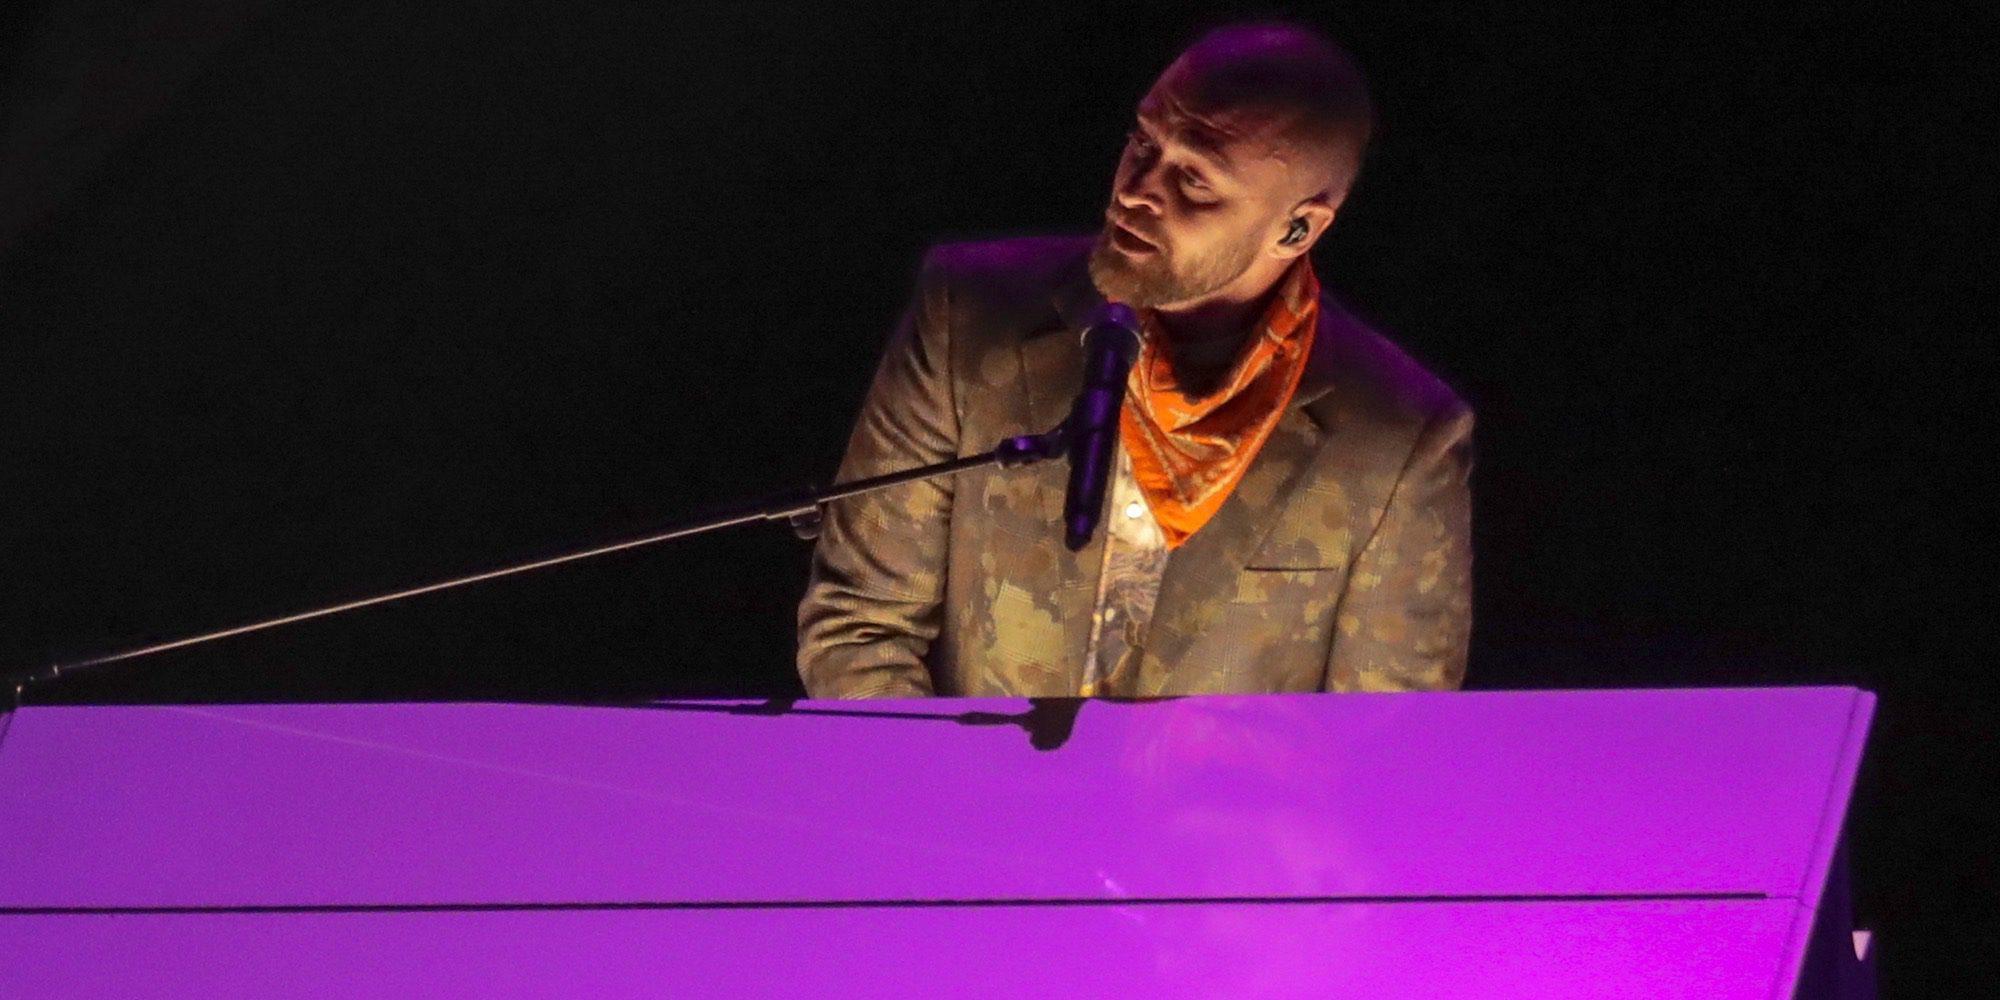 Justin Timberlake, a dúo con Prince en la Super Bowl 2018 donde toda Minneapolis se tiñó de púrpura